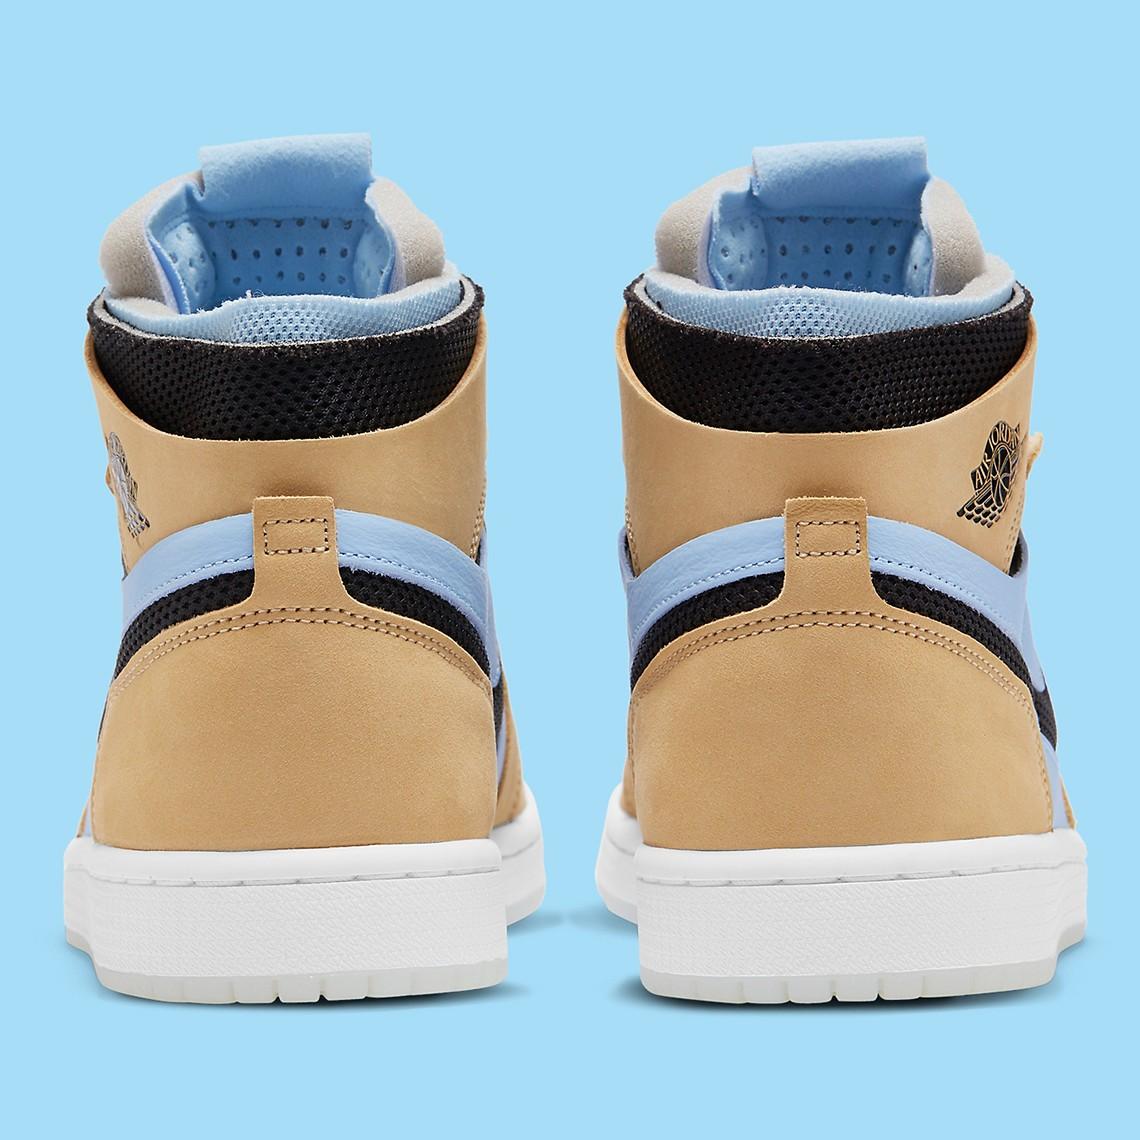 Nike,Air Jordan 1 ZMFT,曝光  清新冰蓝色调 + 芝麻!最爽脚感 Air Jordan 1 新配色曝光!